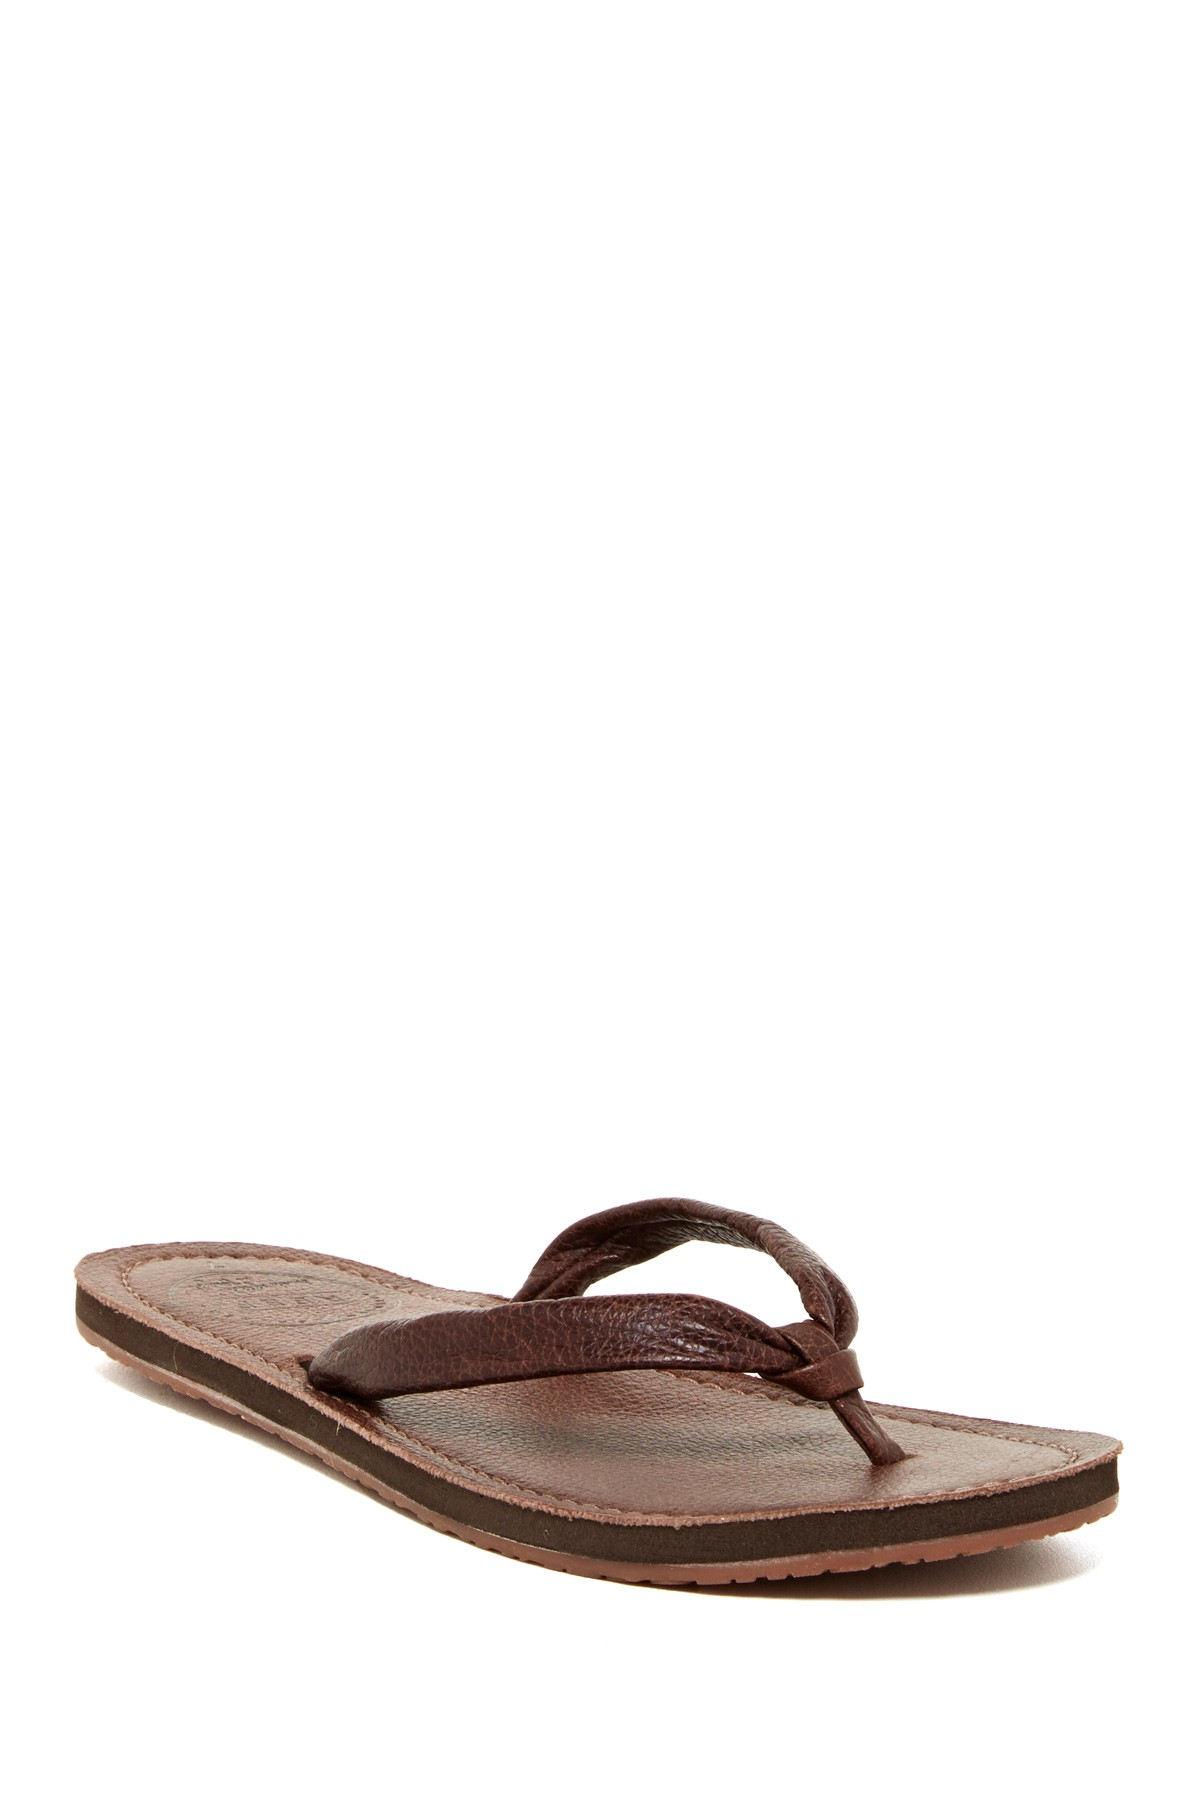 Simple Women Reef Slap 2 Brown Pink Zebra Flip Flops Sandals Size 5-10 | EBay